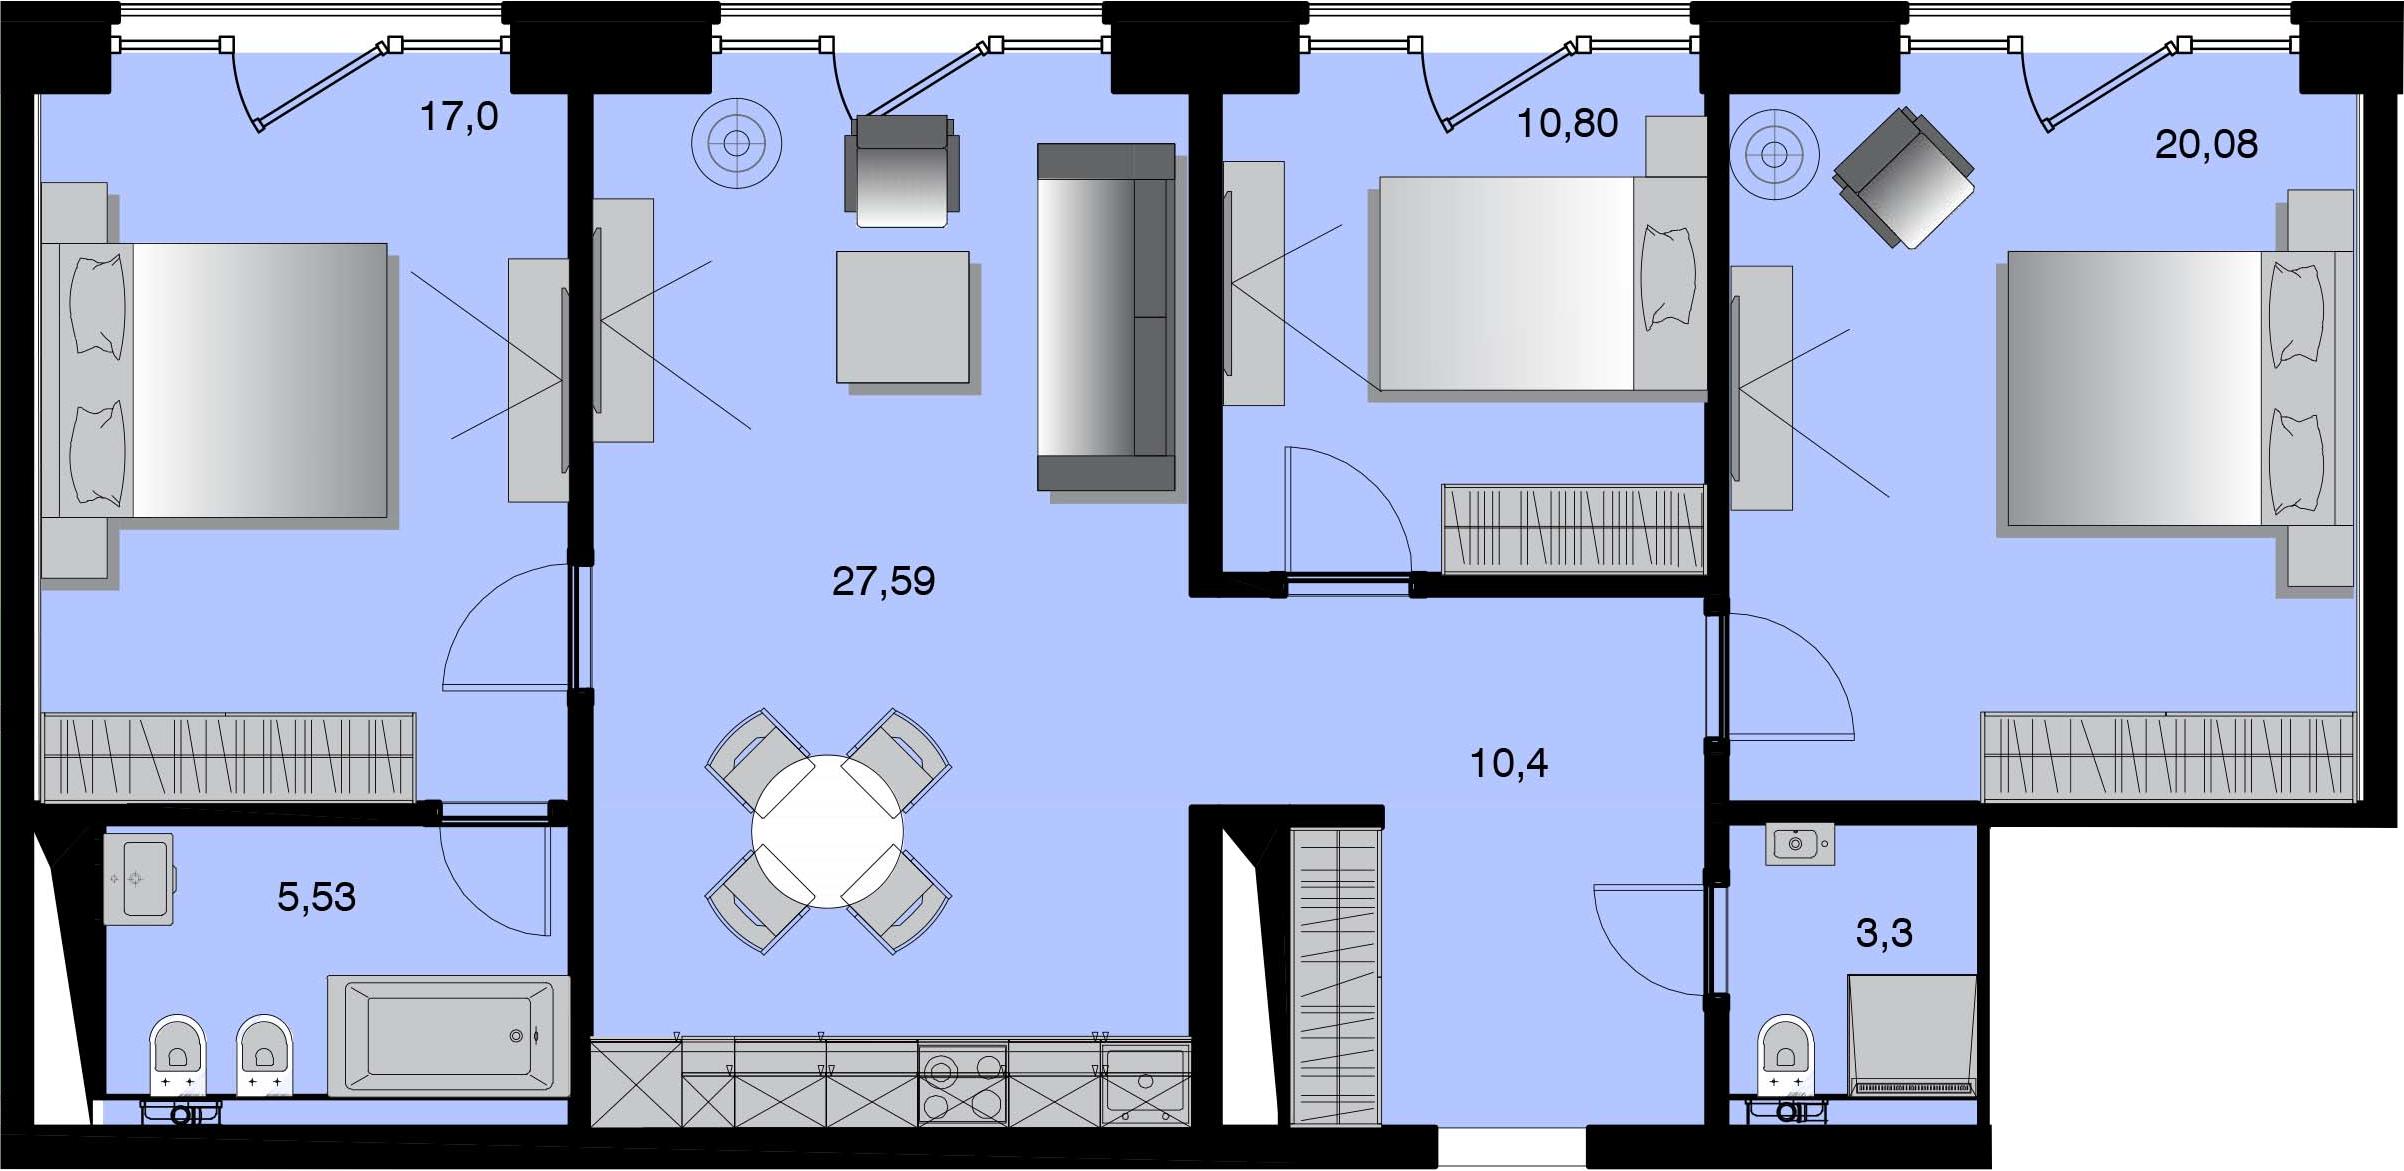 4Е-к.кв, 94.7 м²